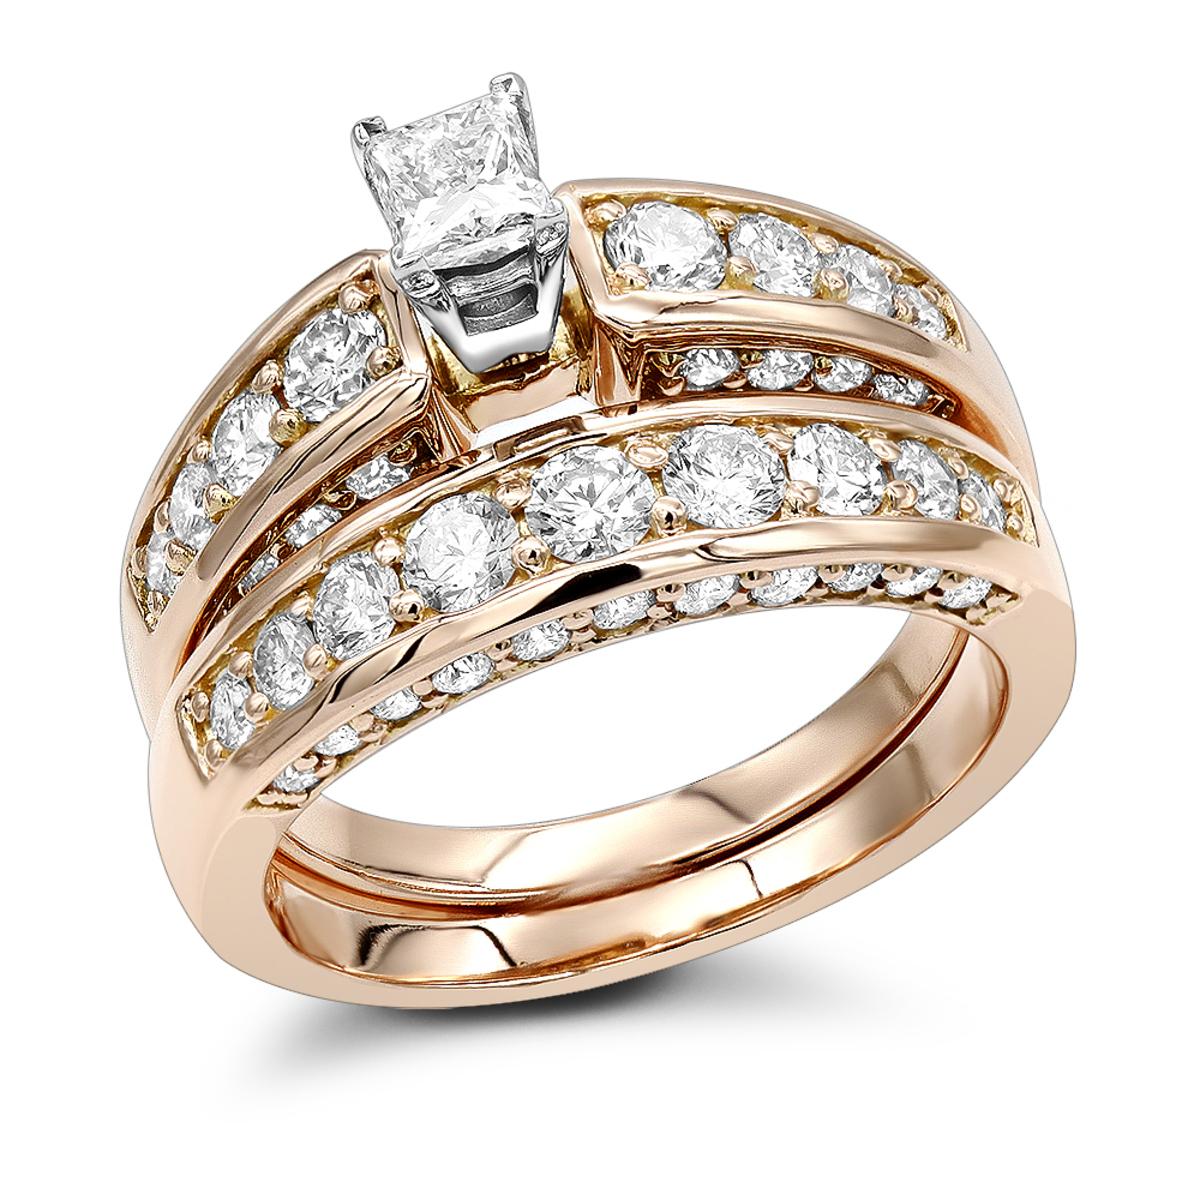 14K Round Princess Diamond Engagement Ring Set 3.07ct